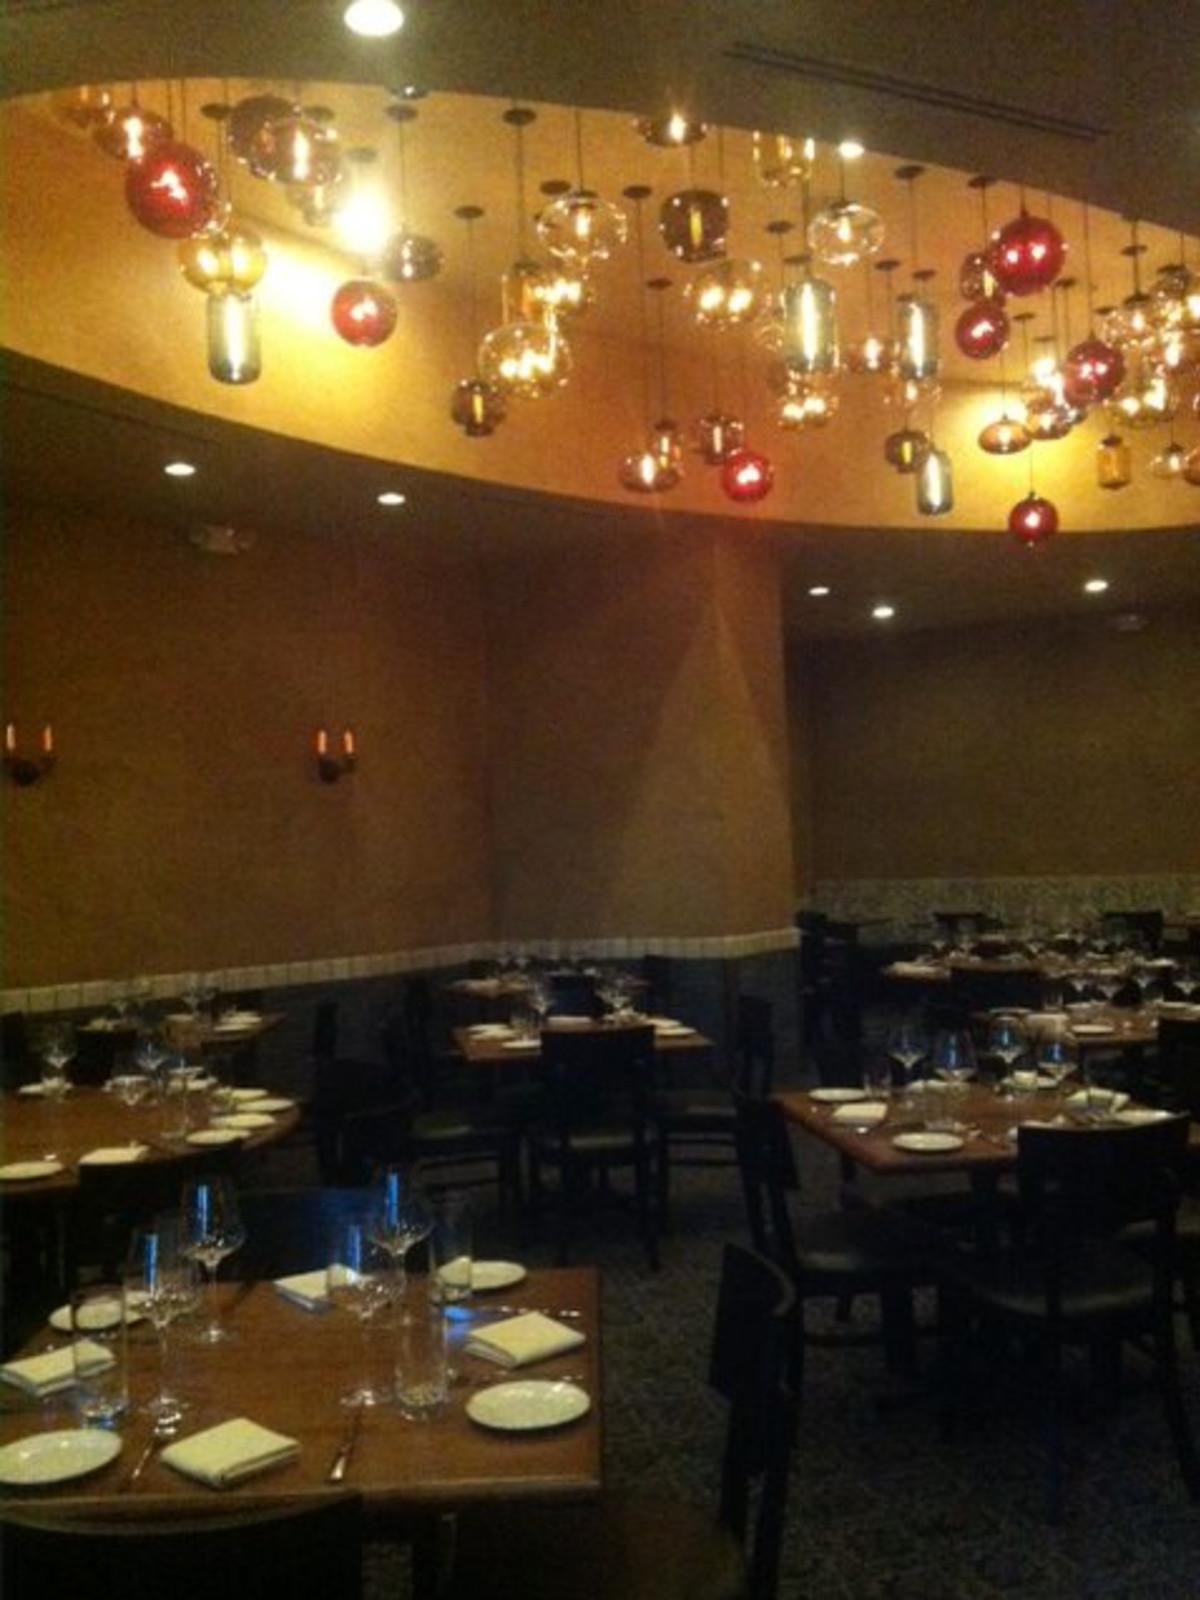 Osteria Mazzantini dining room August 2013